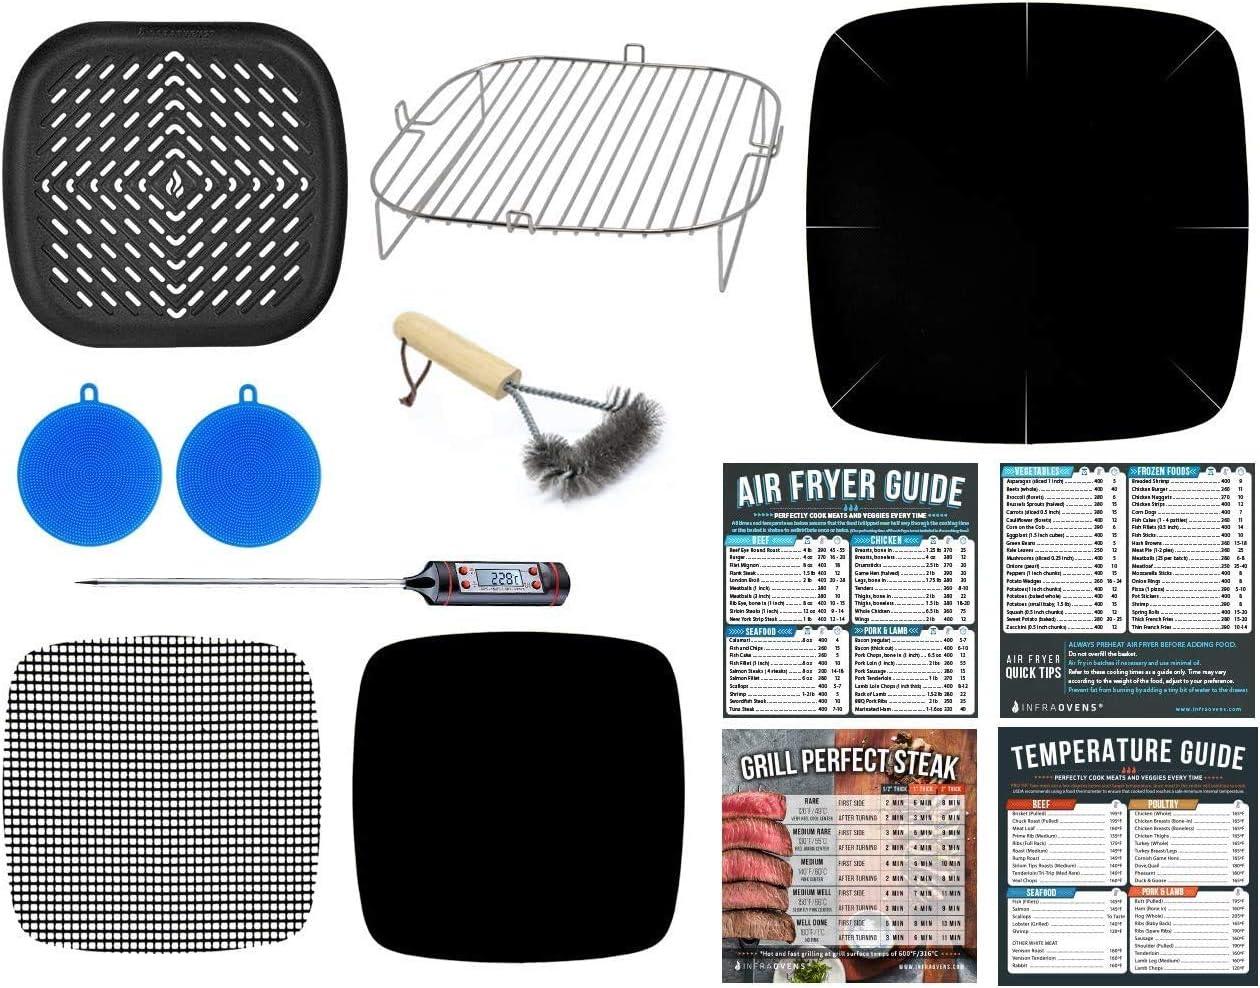 Air Fryer Rack 9.7 inch Toaster Oven Accessories Compatible With Costway 19 QT, Aaobosi 21 QT, Caynel 12.5 quarts, Paula Deen 9.5 QT, Zokop 16.9 QT, Dash Chef + More XXL + Cooking Cheat Sheet Magnets